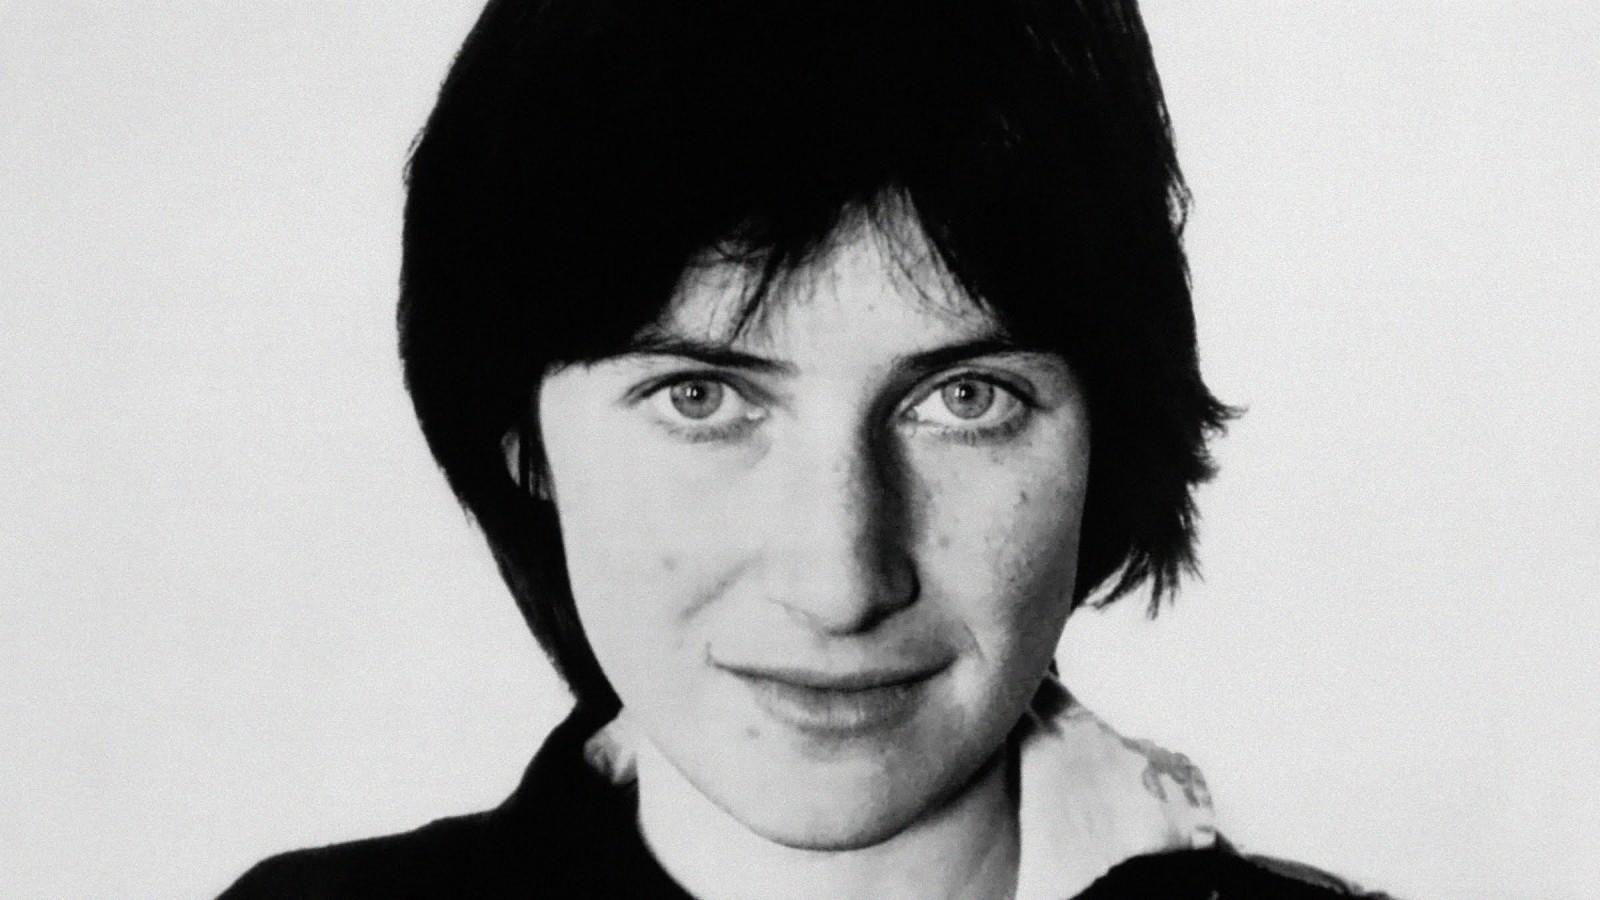 Mother Lode: Chantal Akerman's Maternal Portraiture